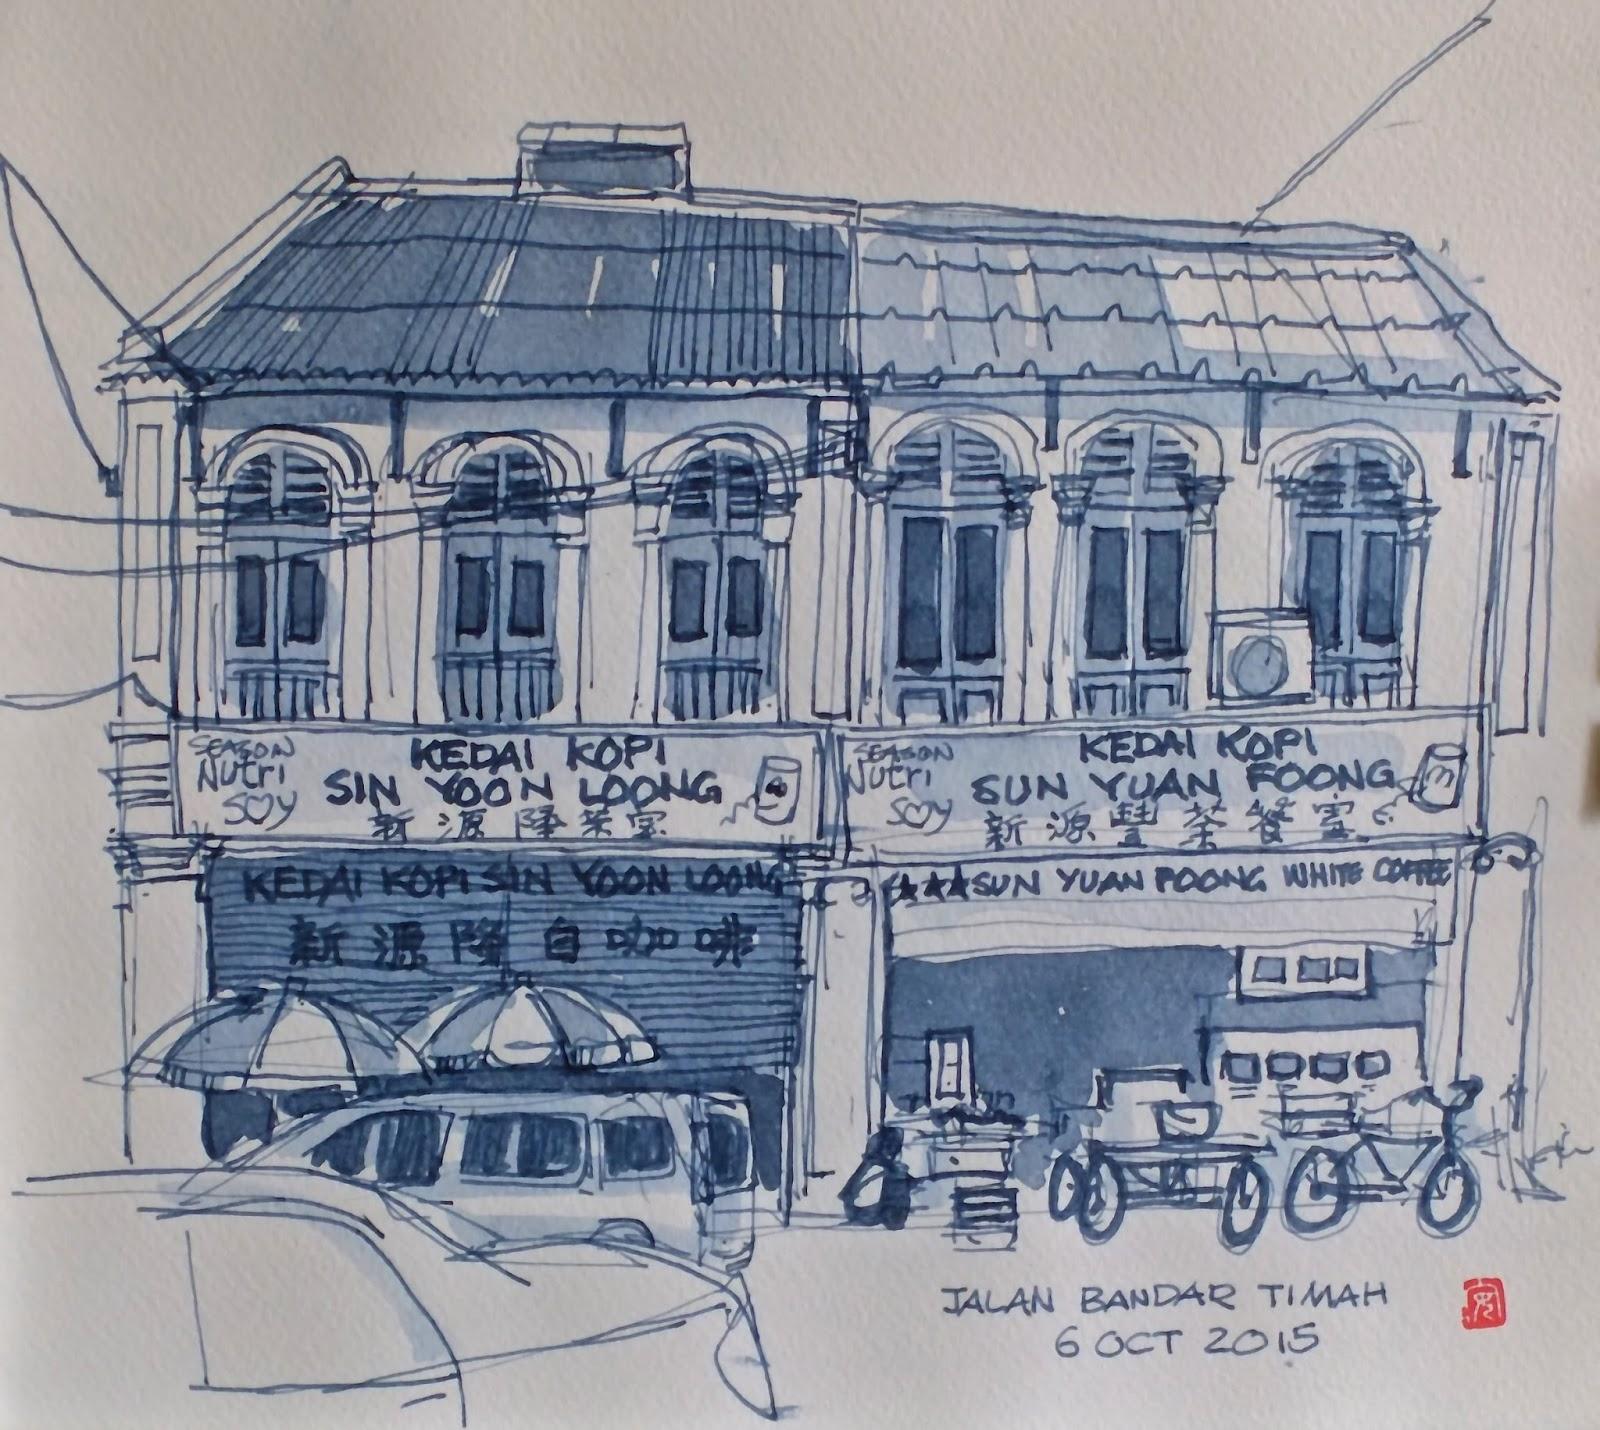 Urban Sketchers Singapore My Sketching Trip To Ipoh Kuala Kopi Keong Mas Posted By Francis Theo